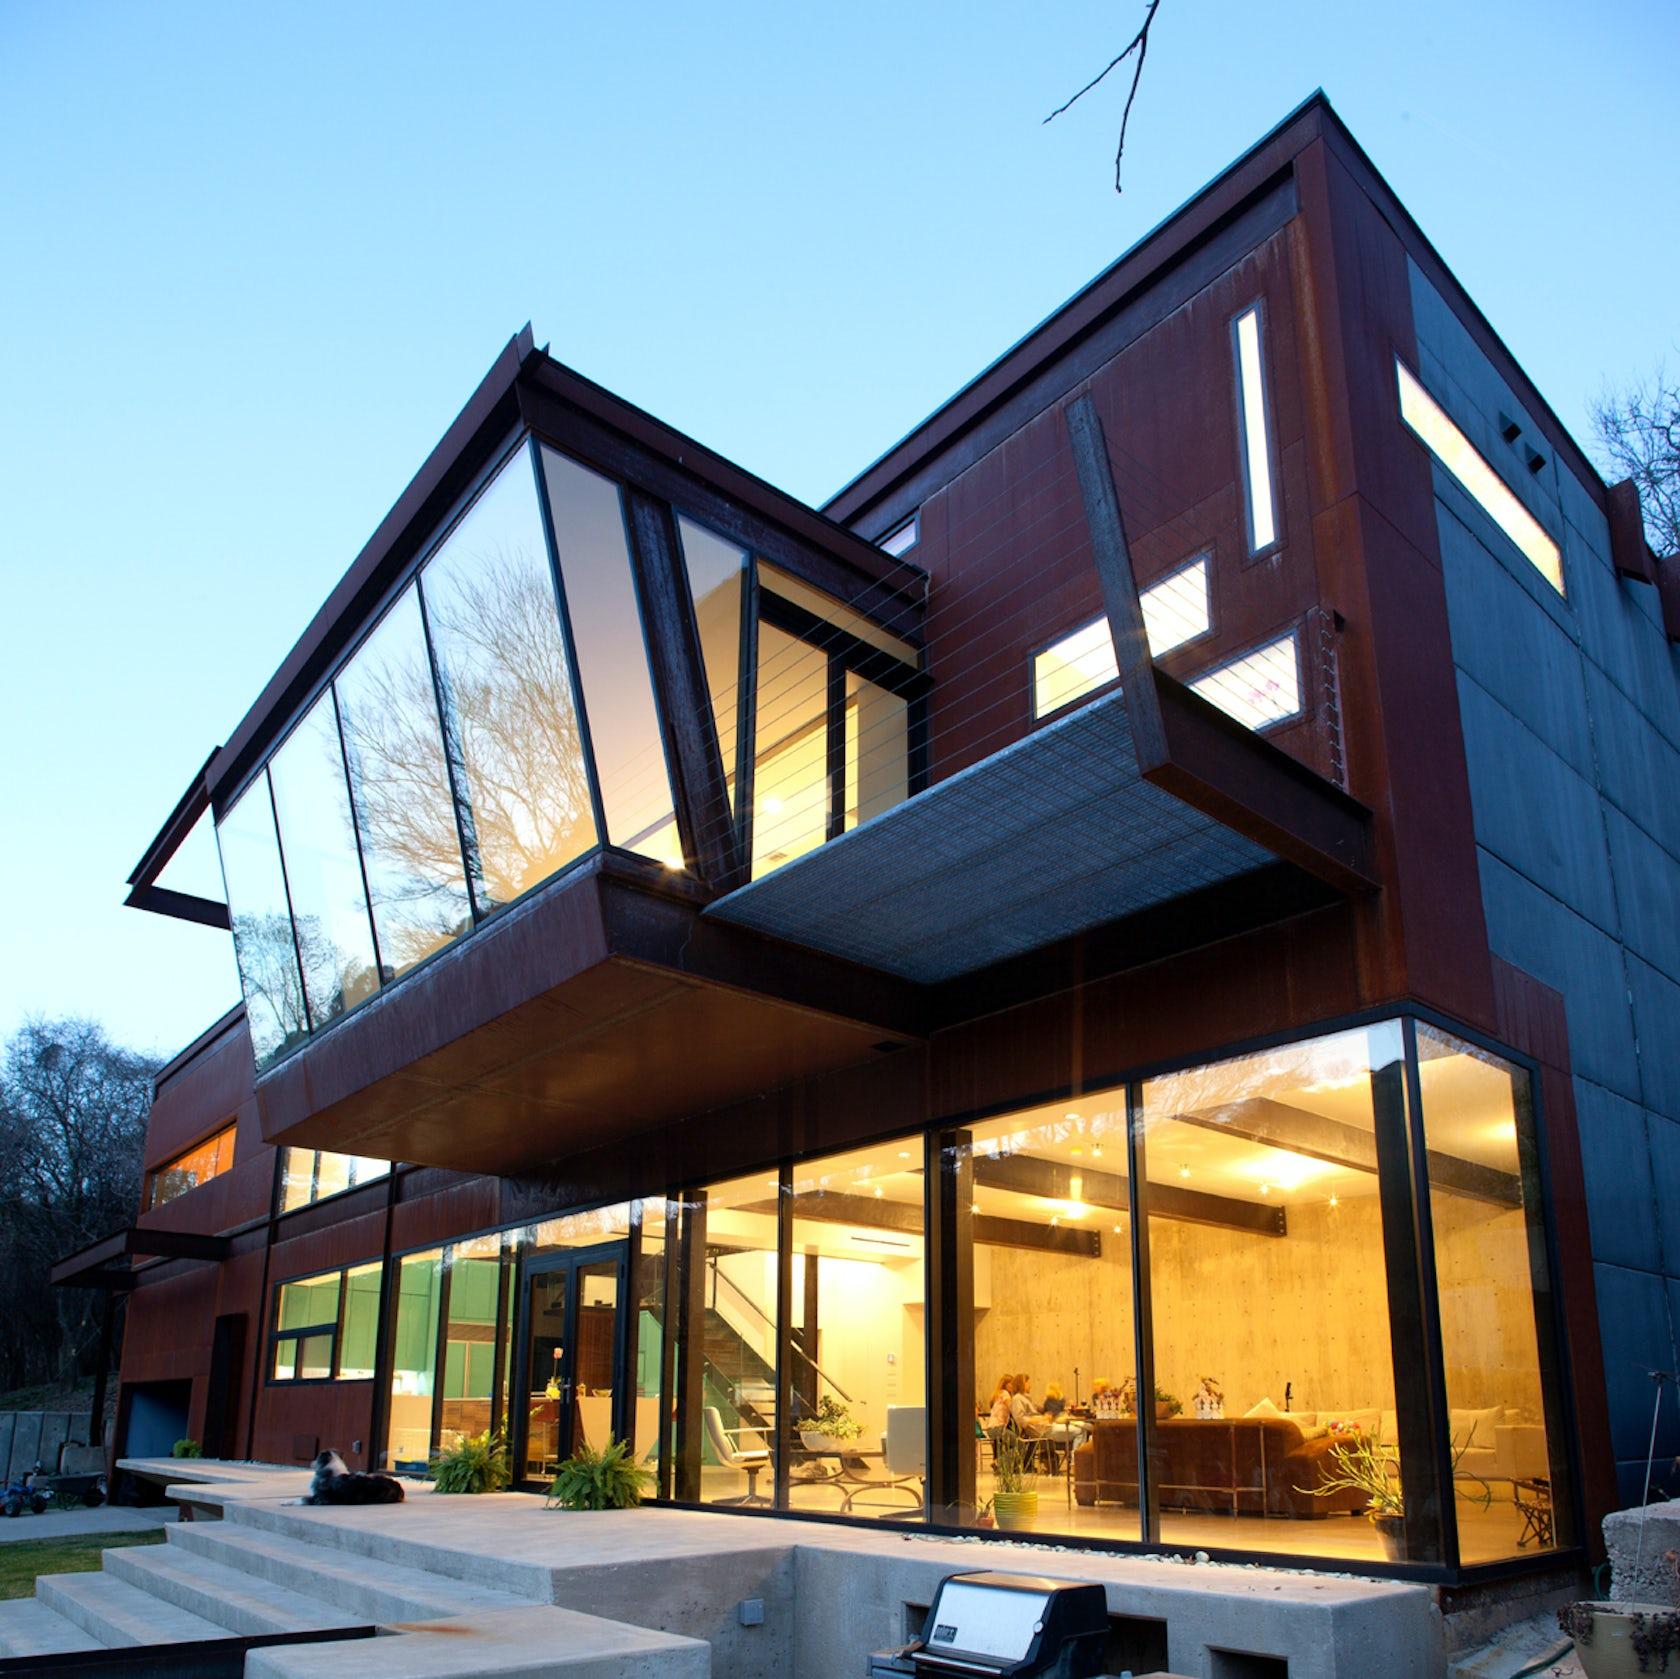 Lake austin residence architizer - Construcciones de casas modernas ...